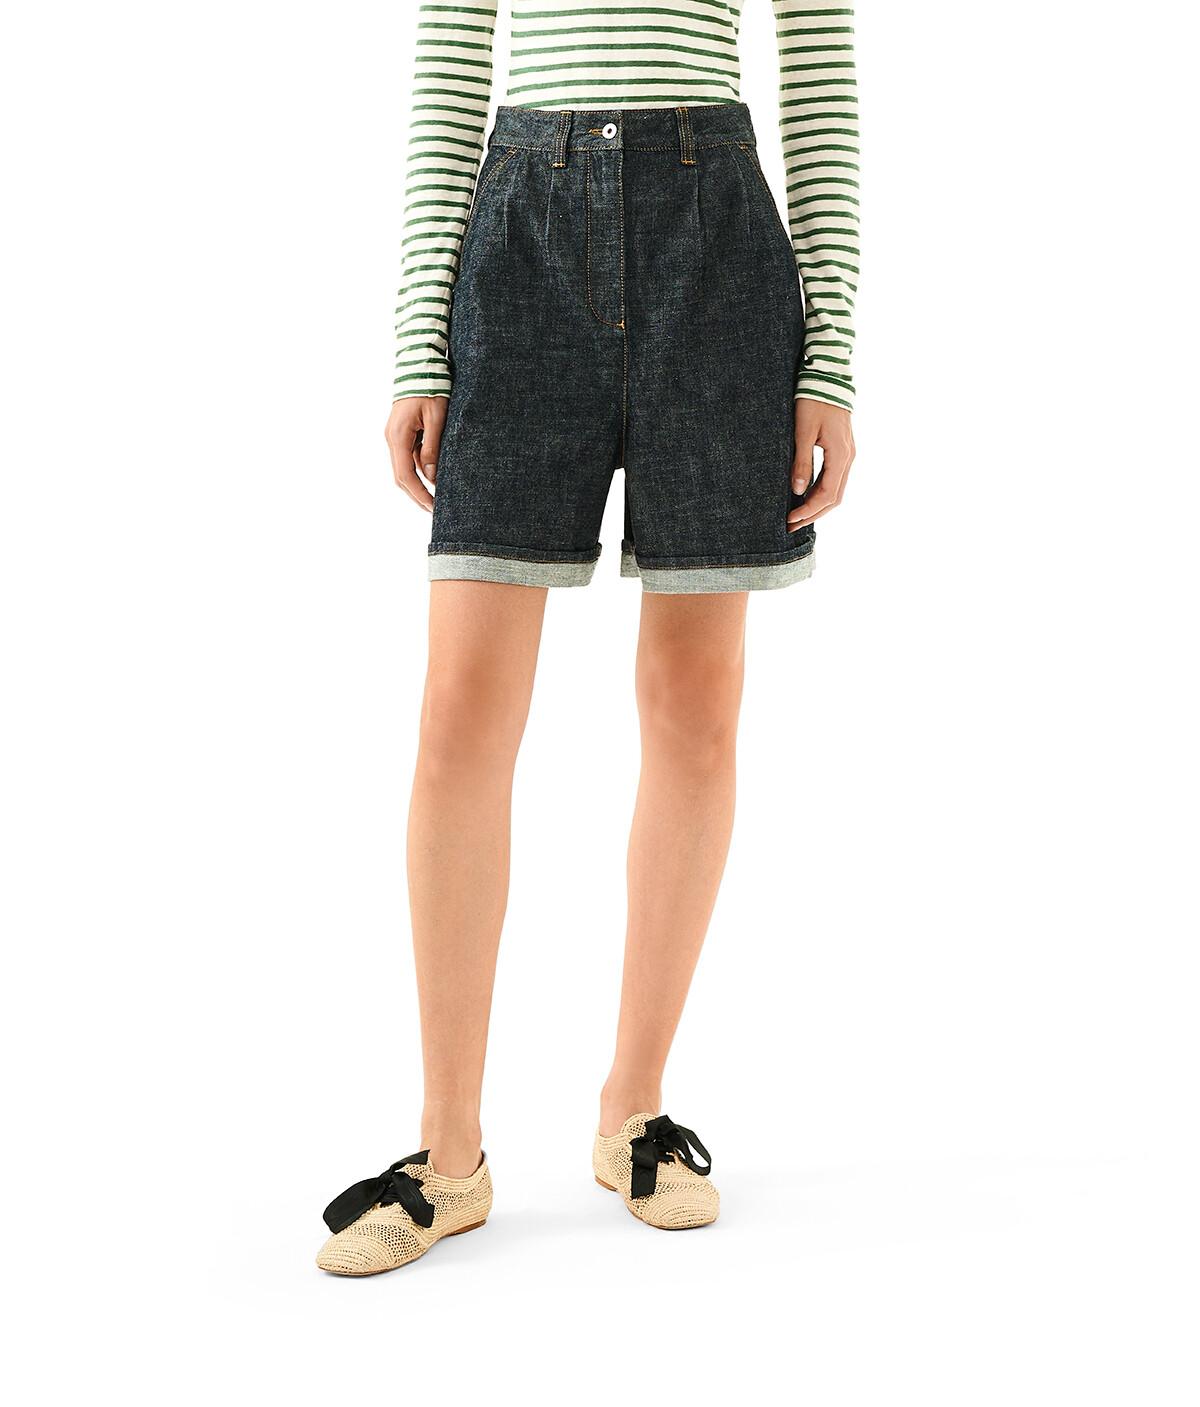 LOEWE Denim Shorts Indigo front